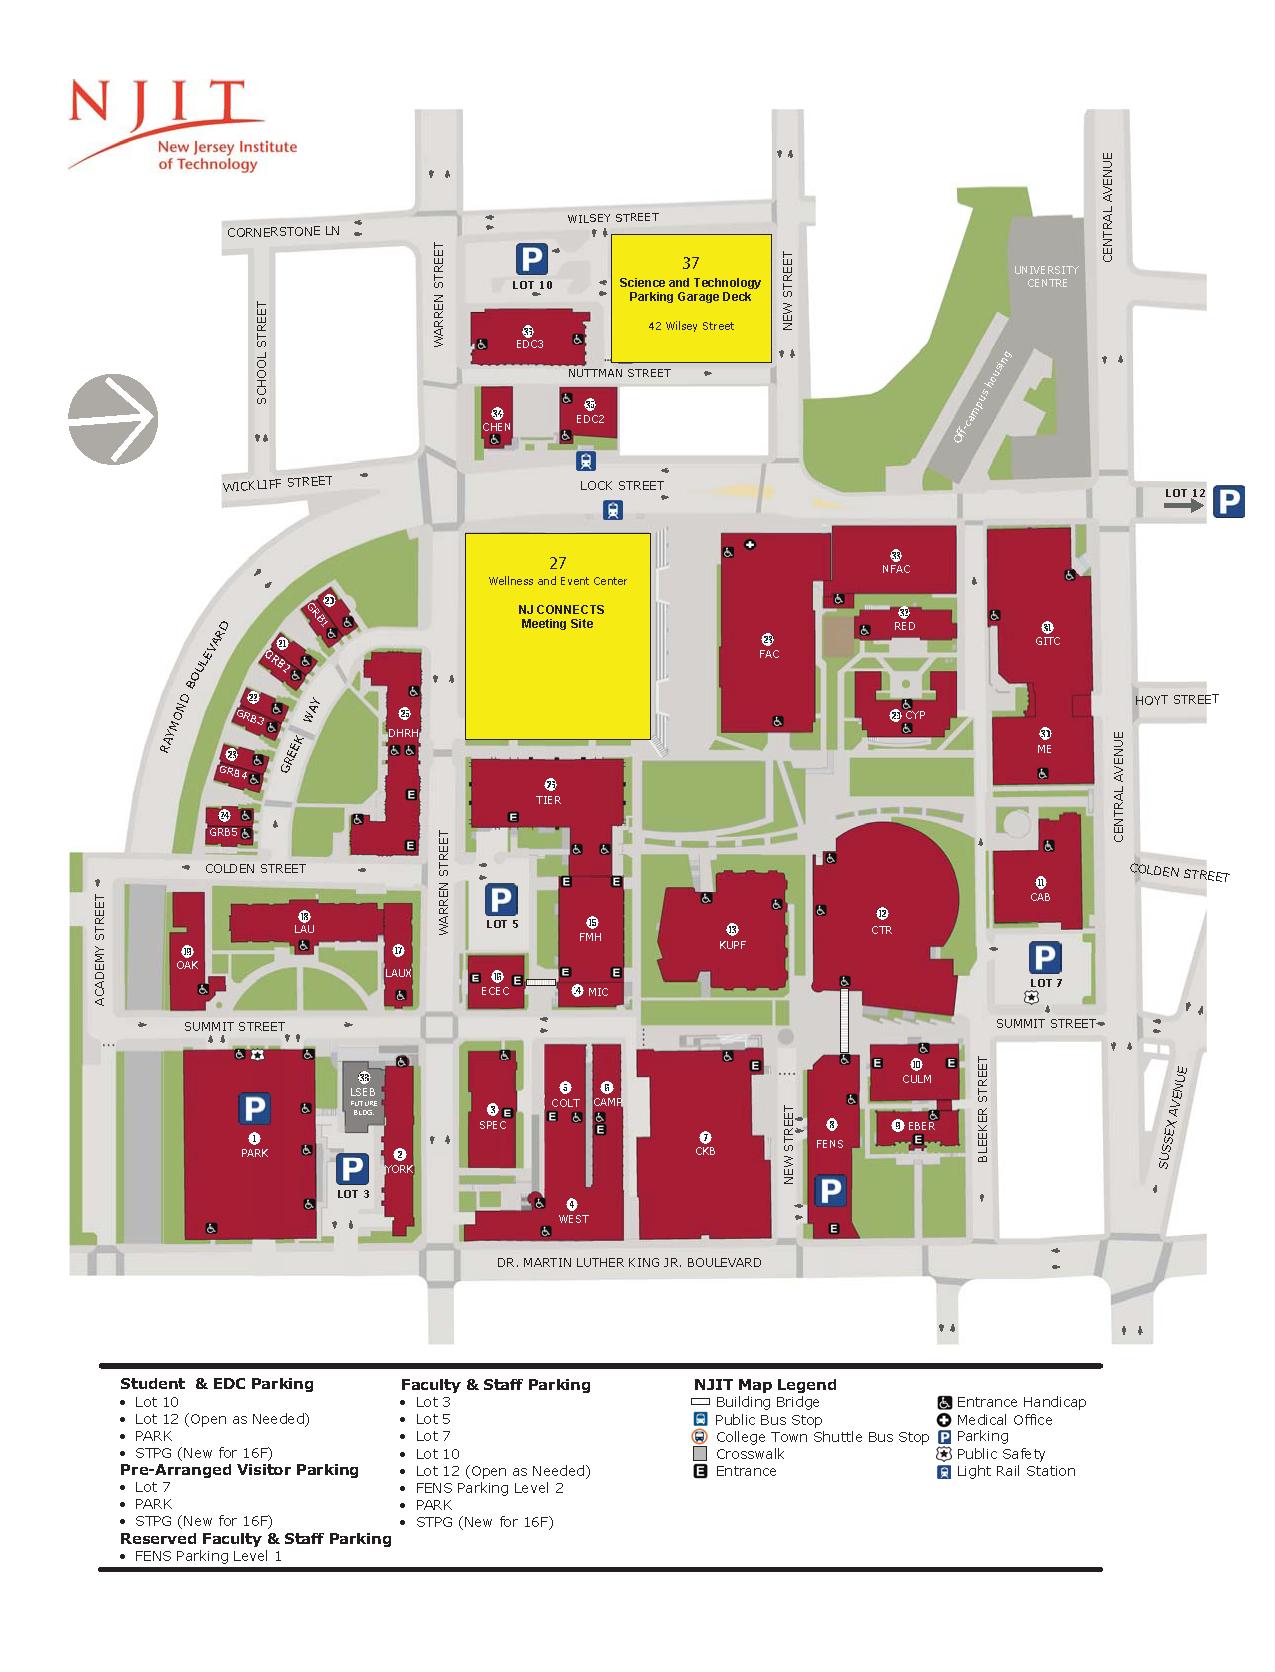 NJIT PARKING MAP